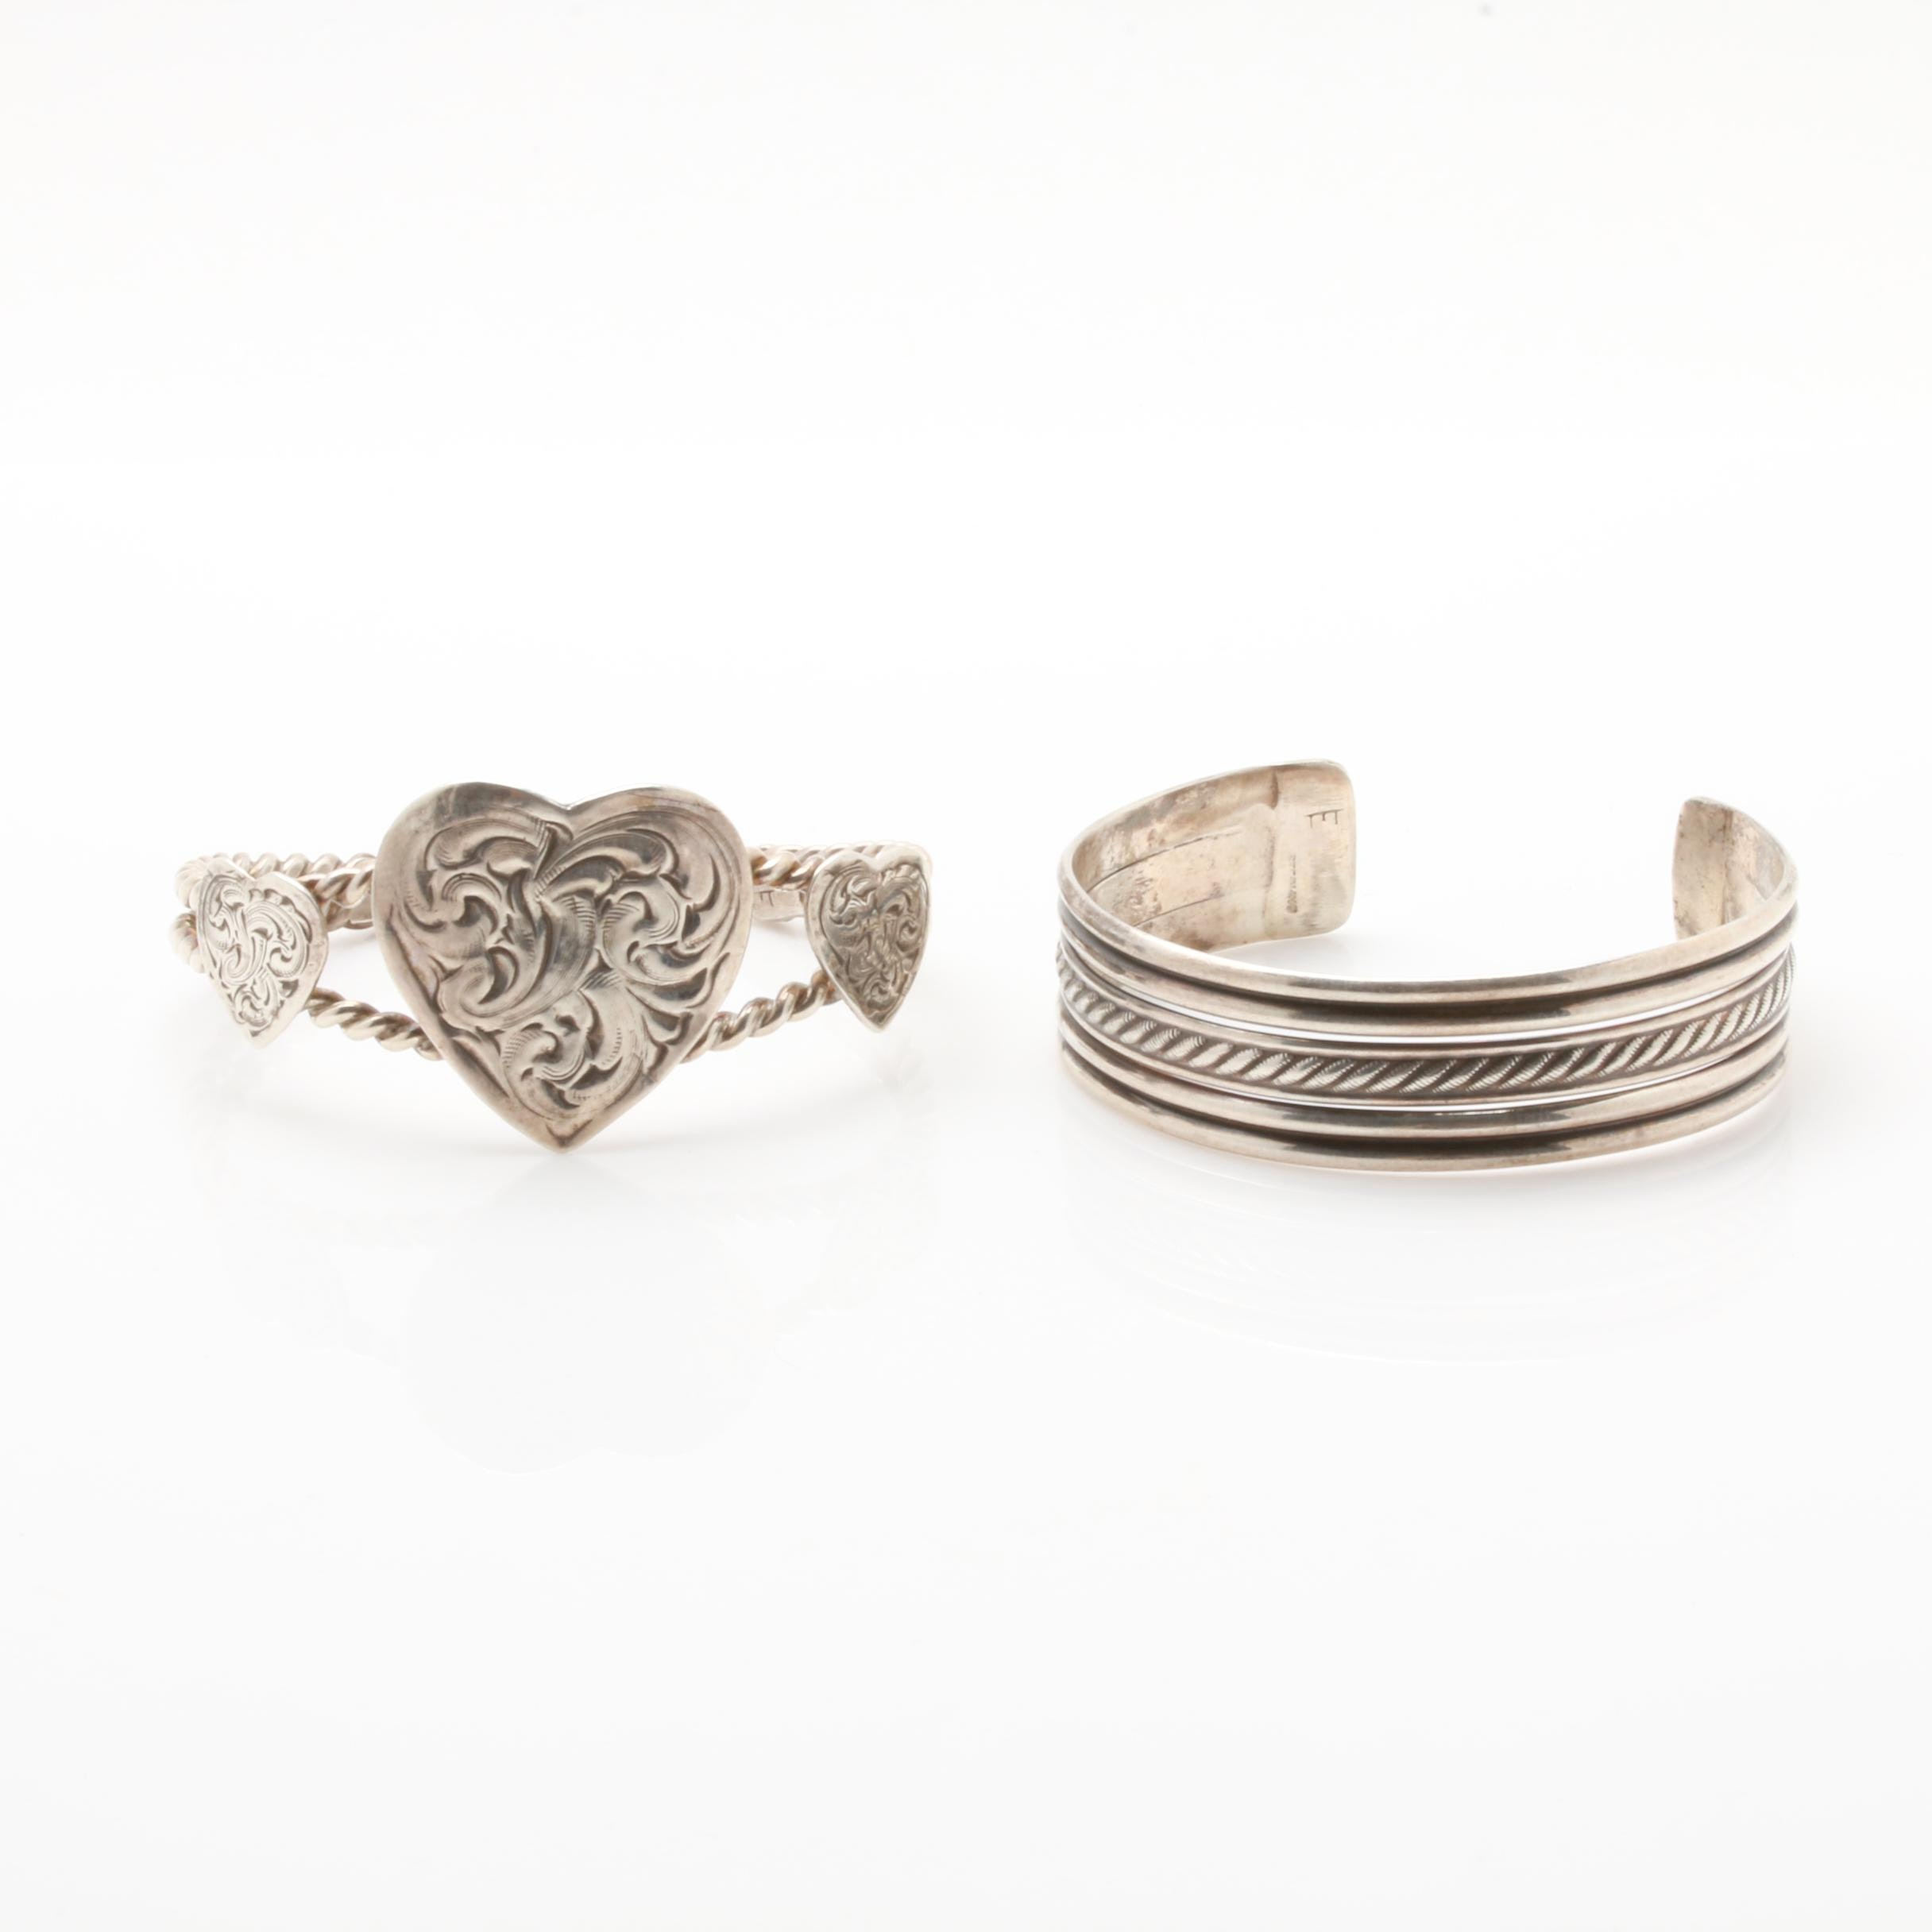 Ella Cowboy Navajo Diné Sterling Silver Cuff Bracelets